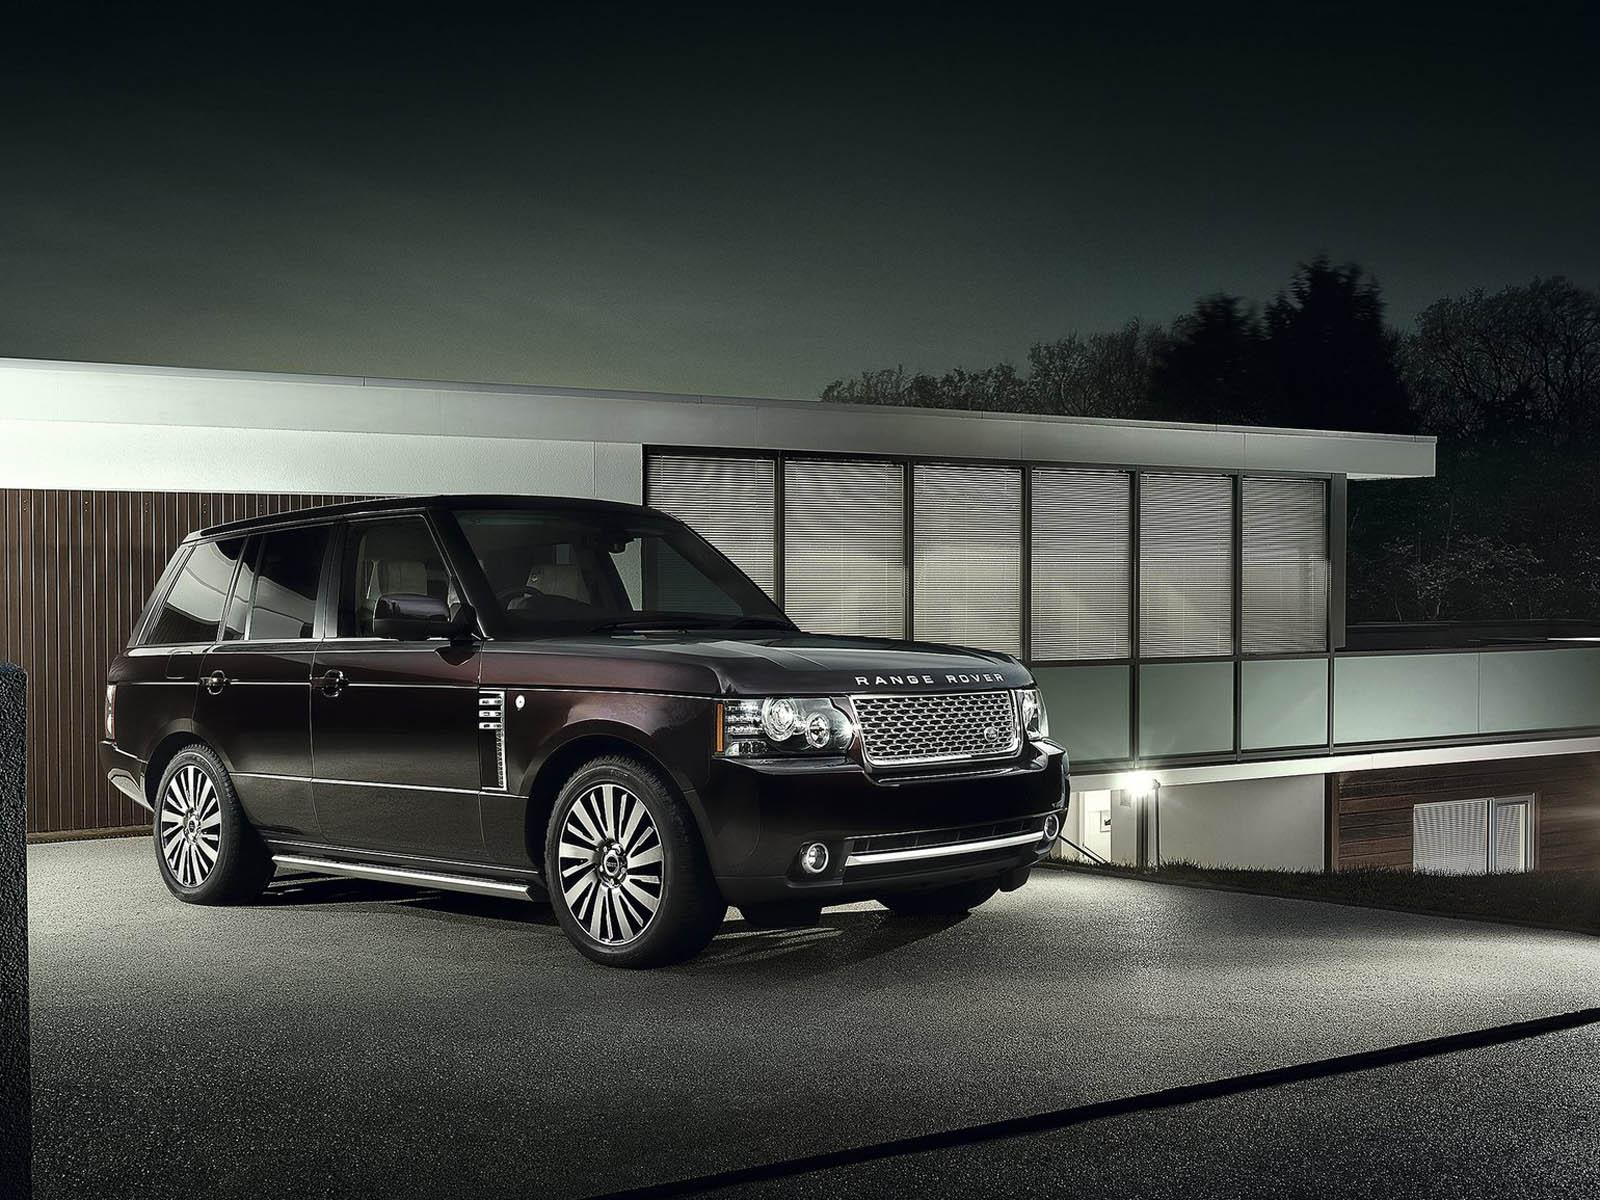 2019 land rover range rover evoque wallpapers - Land Rover Car Wallpapers Pictures Land Rover ...